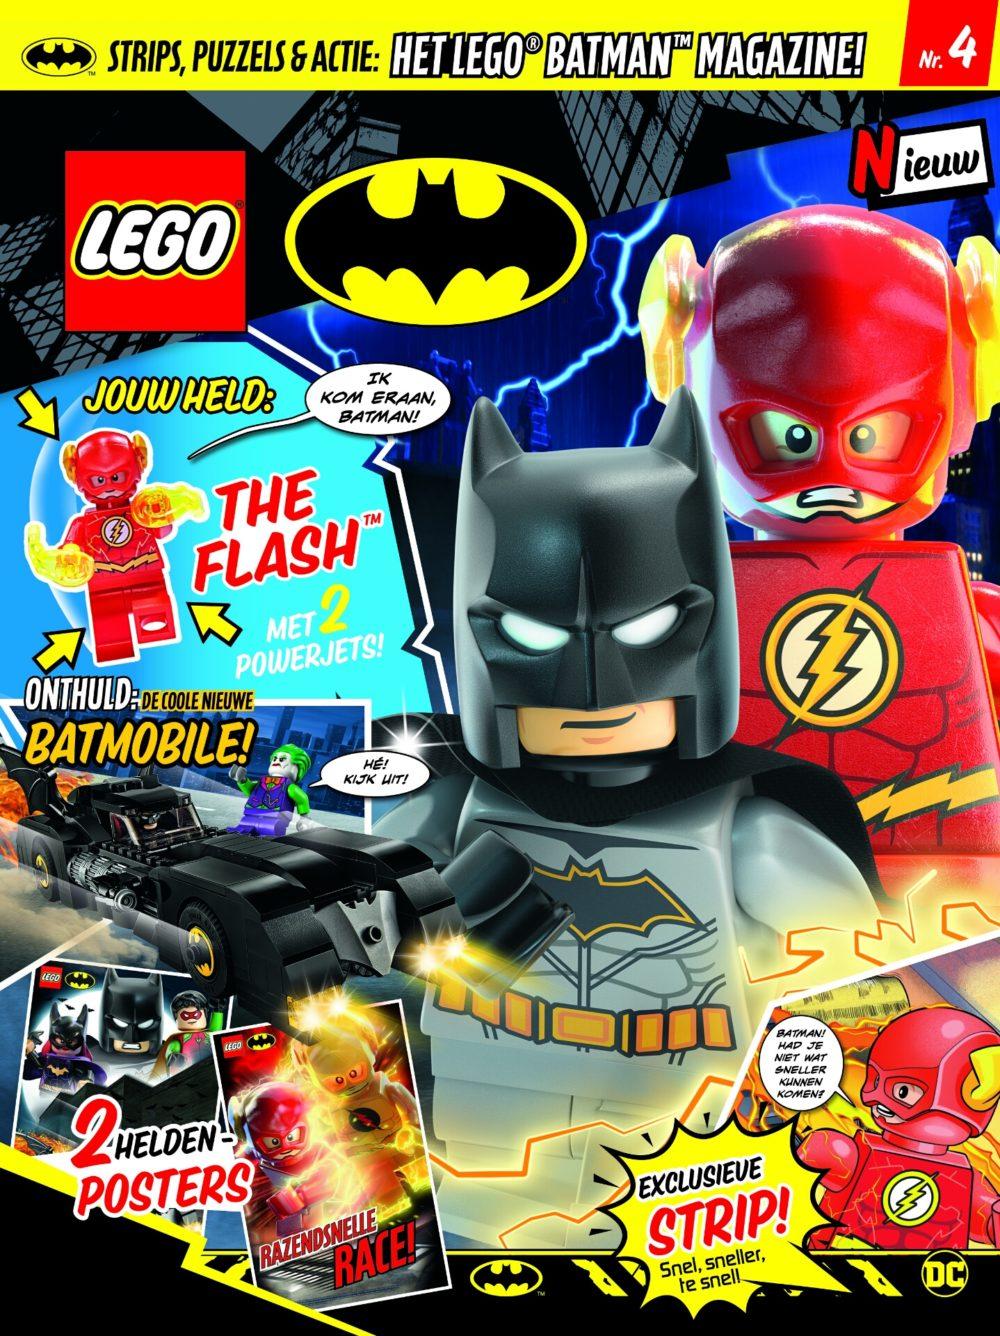 LEGO Batman magazine 4 2019